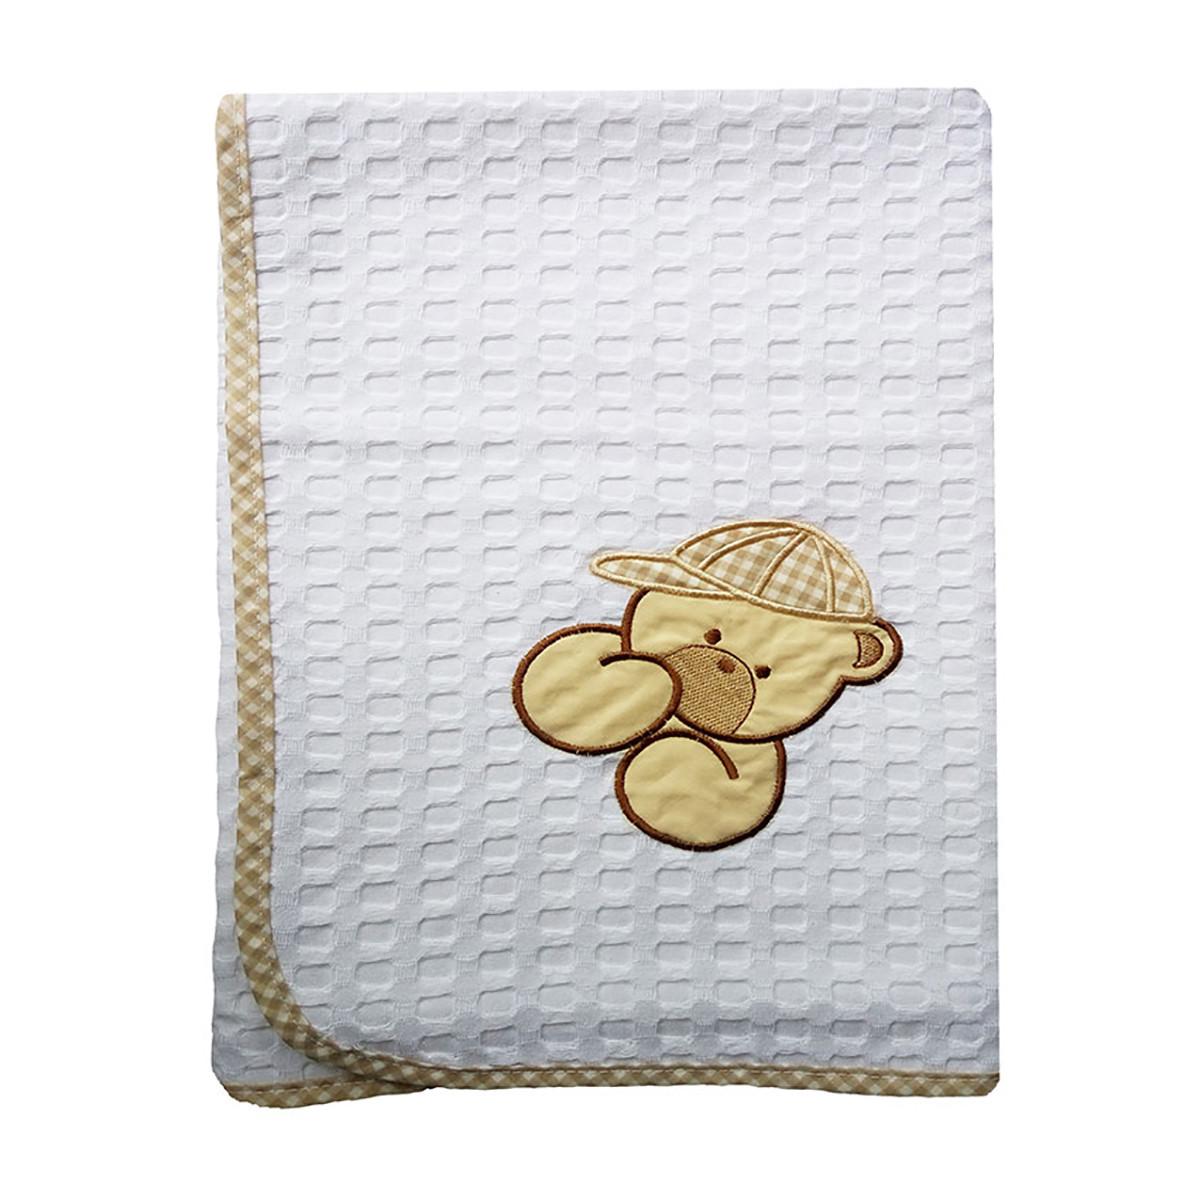 8c1a1c76014 -20% Spiti Shop Κουβέρτα Πικέ Αγκαλιάς Dim Collection Αρκούδος 102